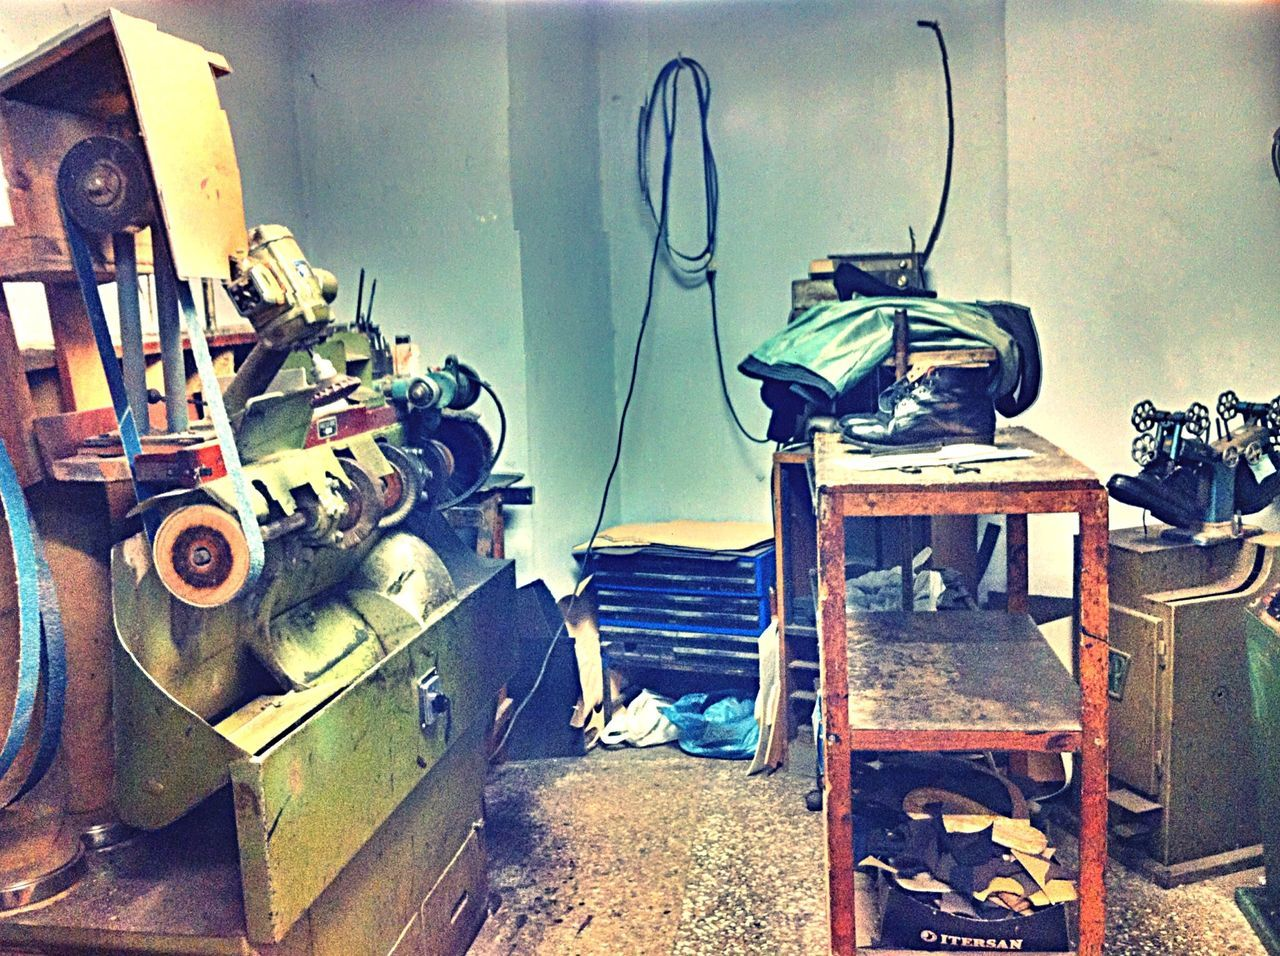 Shoe Maker Calzolaio Lu Scarparu Neviano Italy Stifanibrothers